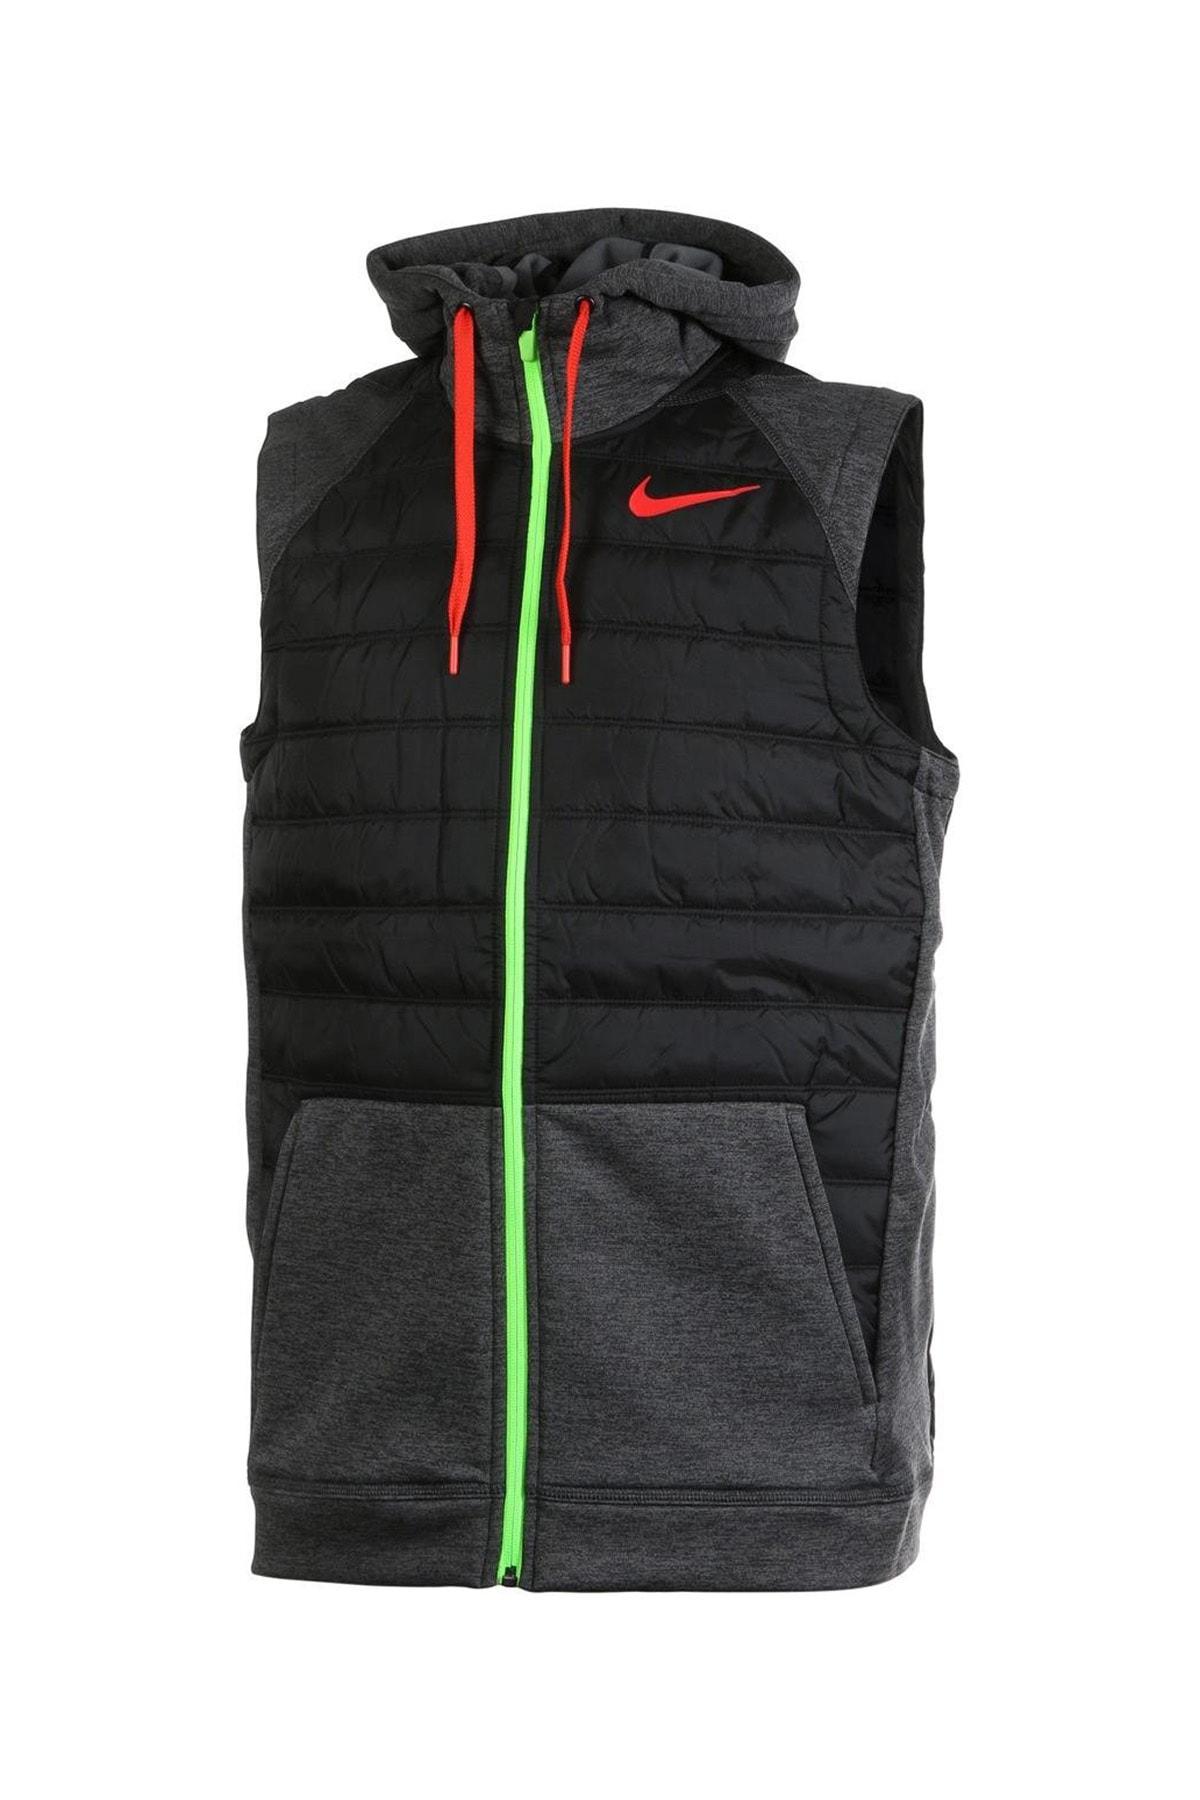 Nike Thermal FZ Vest Winterized Erkek Yelek 0